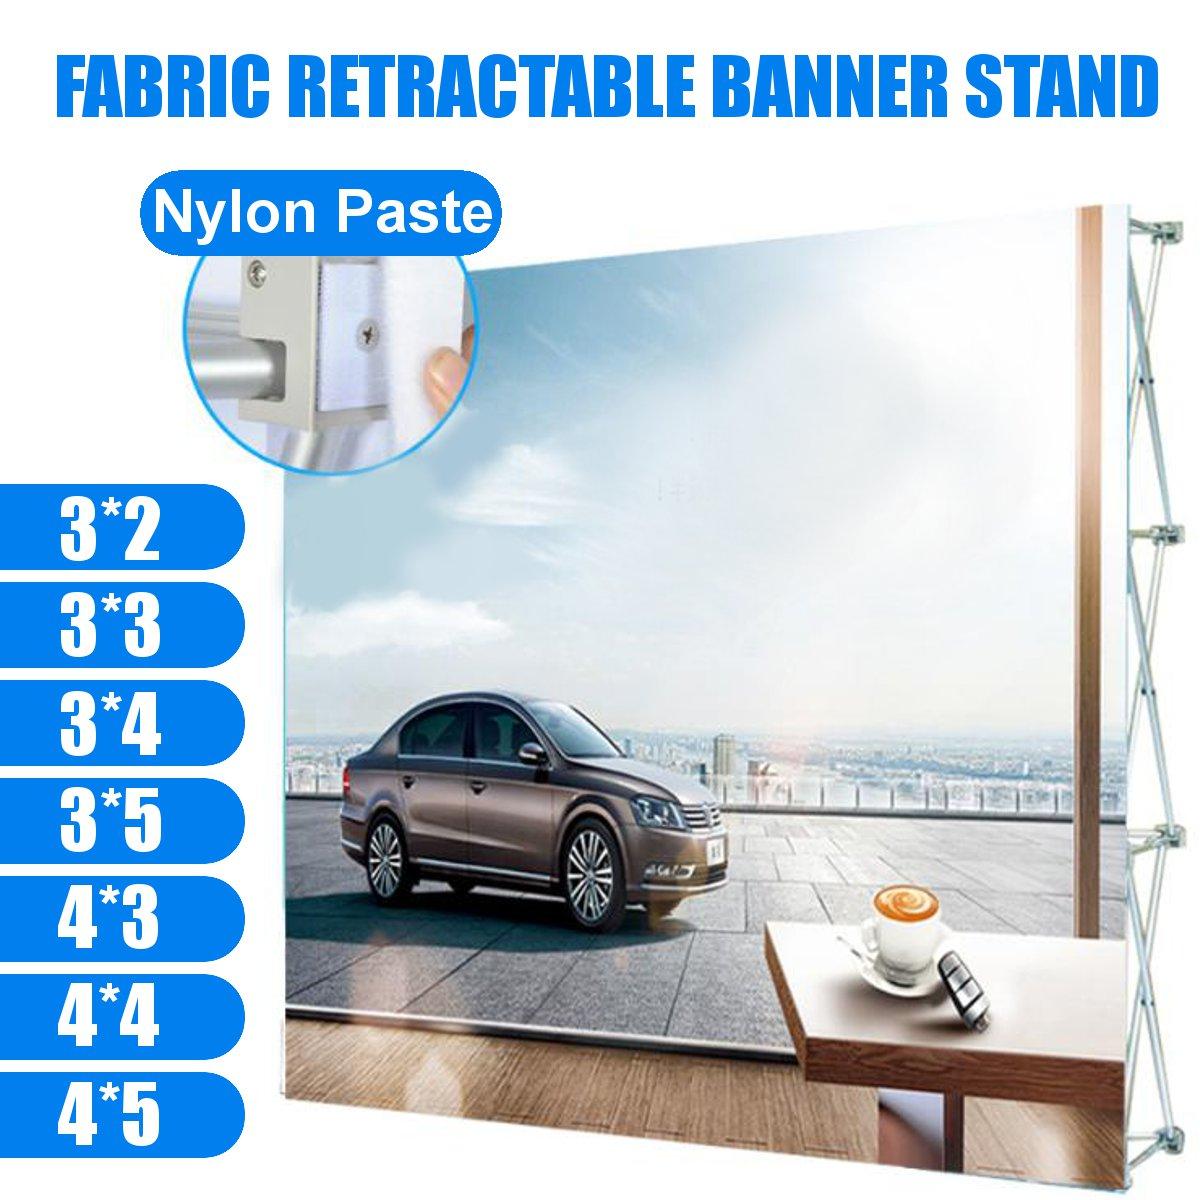 7 Sizes Aluminum Alloy Display Banner Stand Retractable Display Banner Stand Paste Stand Flower Wall Frame Backdrop Banner Rack